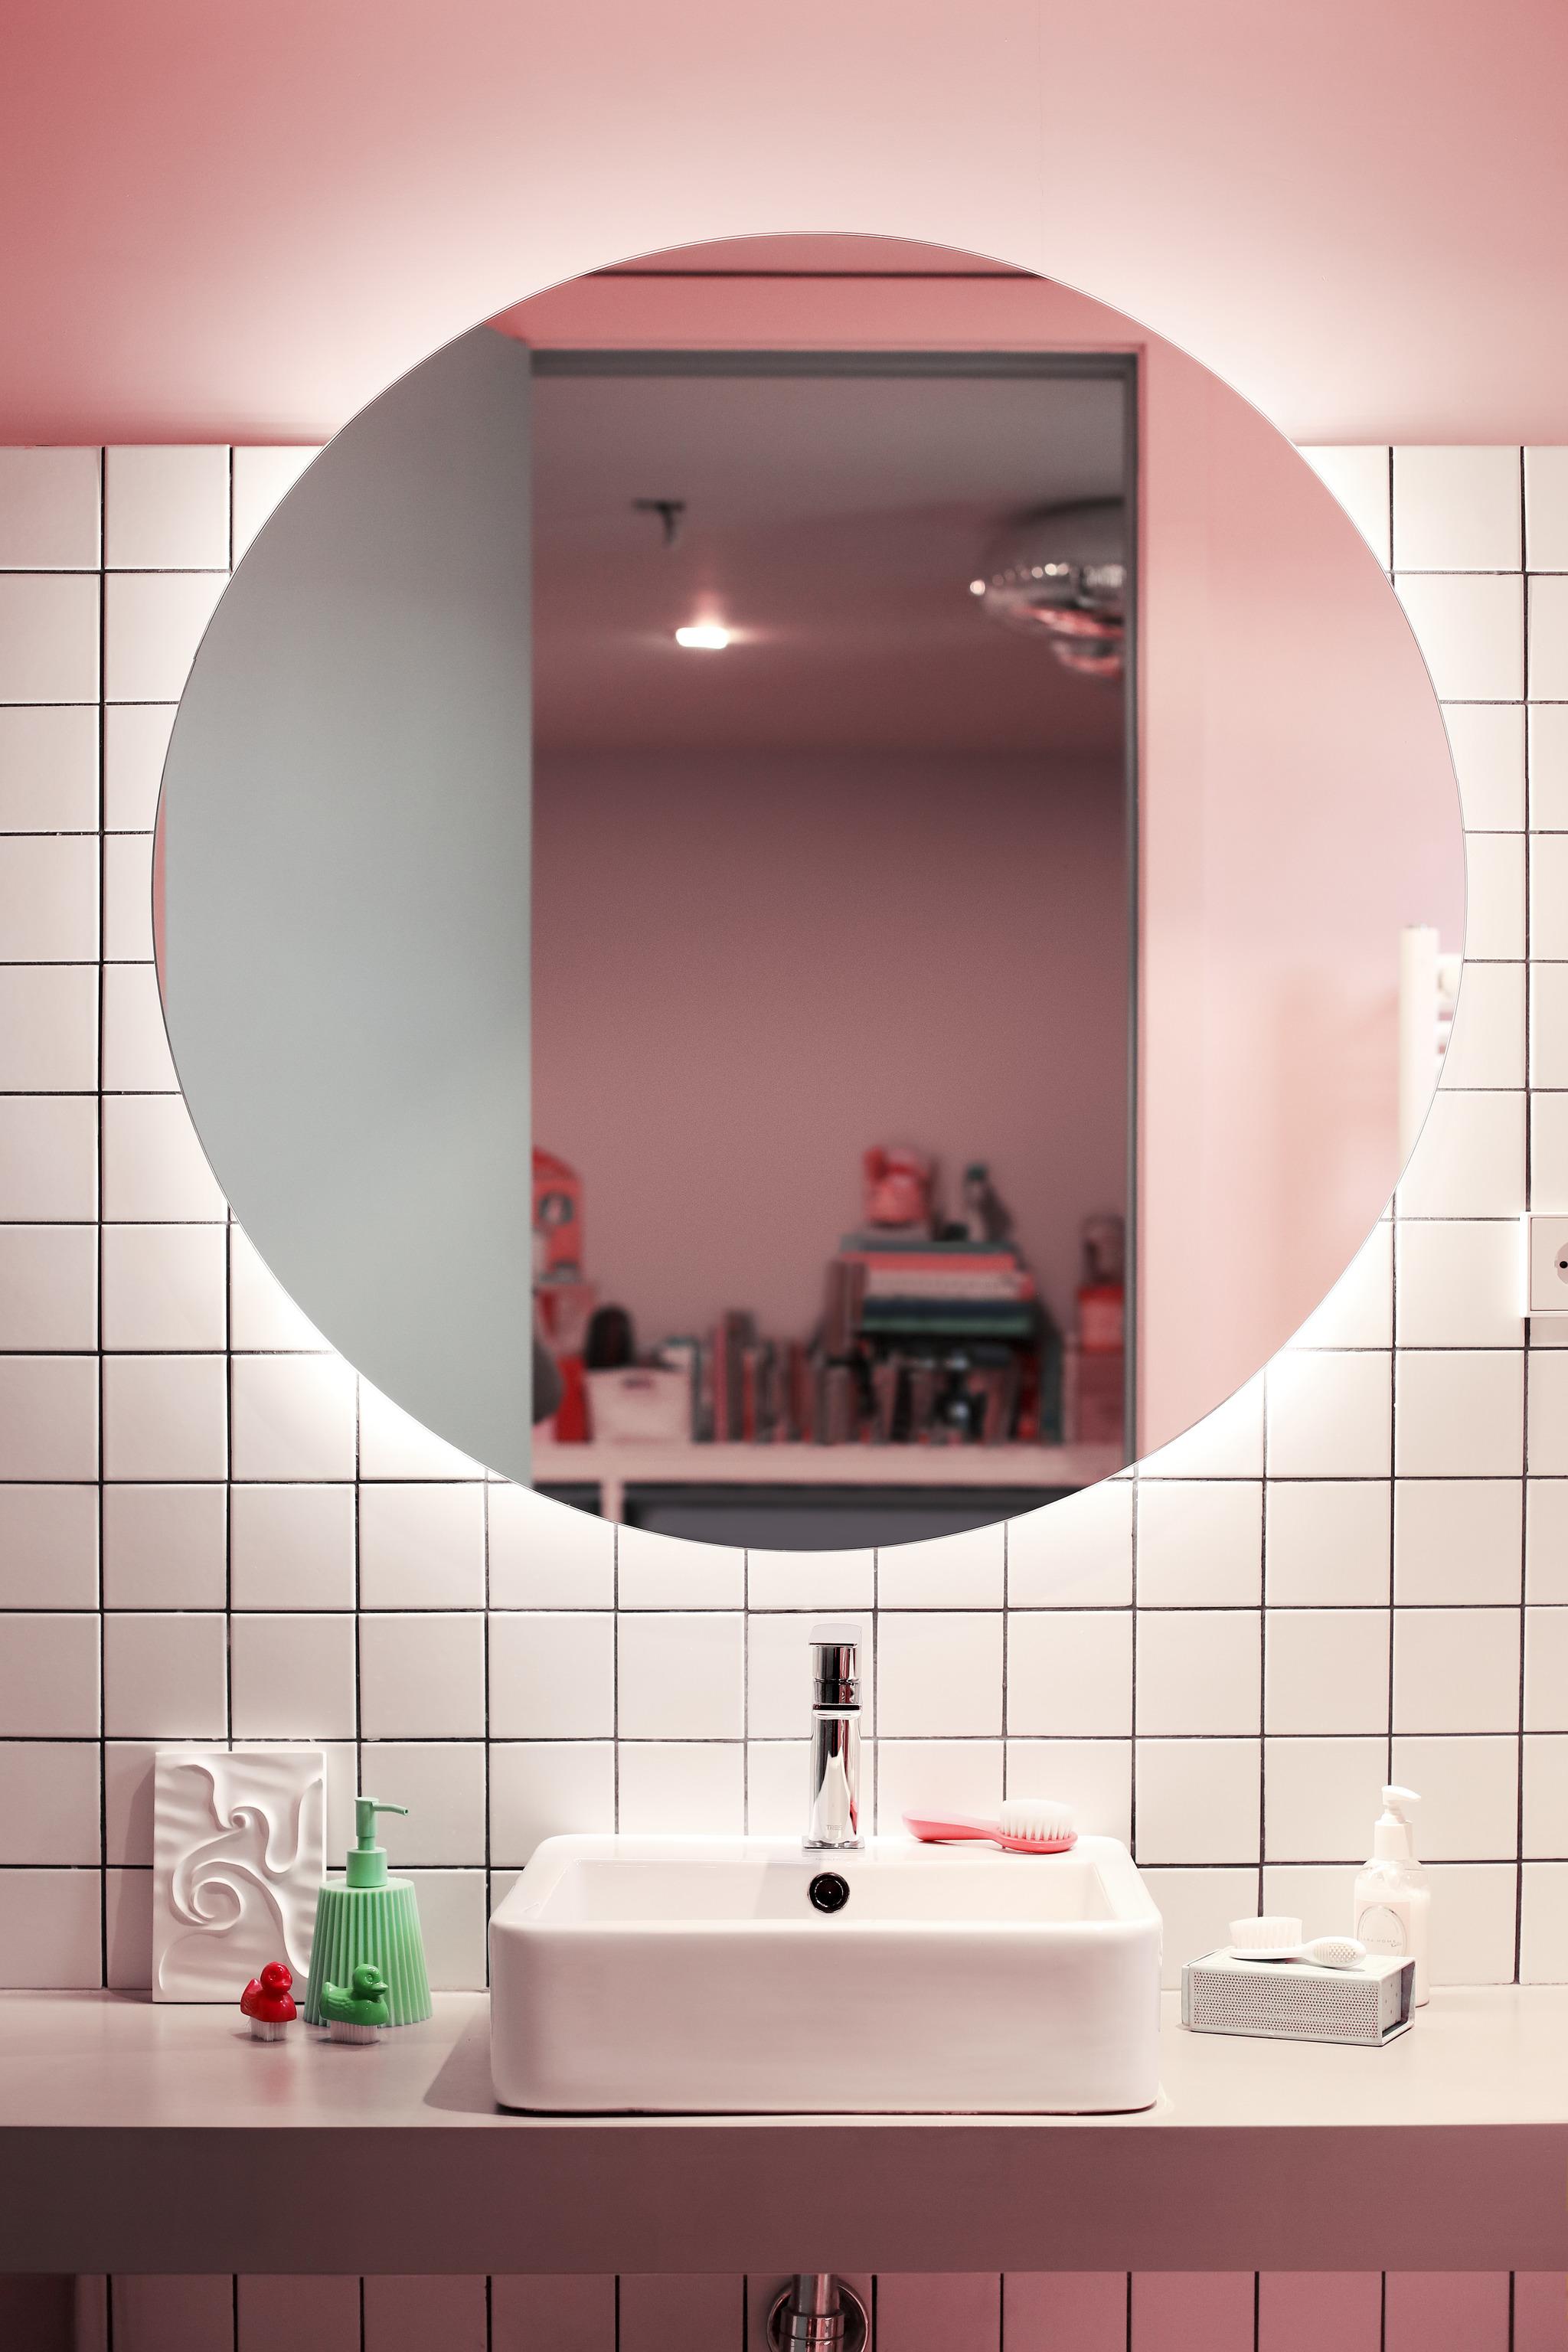 Cuarto de baño infntil en casa de la interiorista Cristina Cirera.